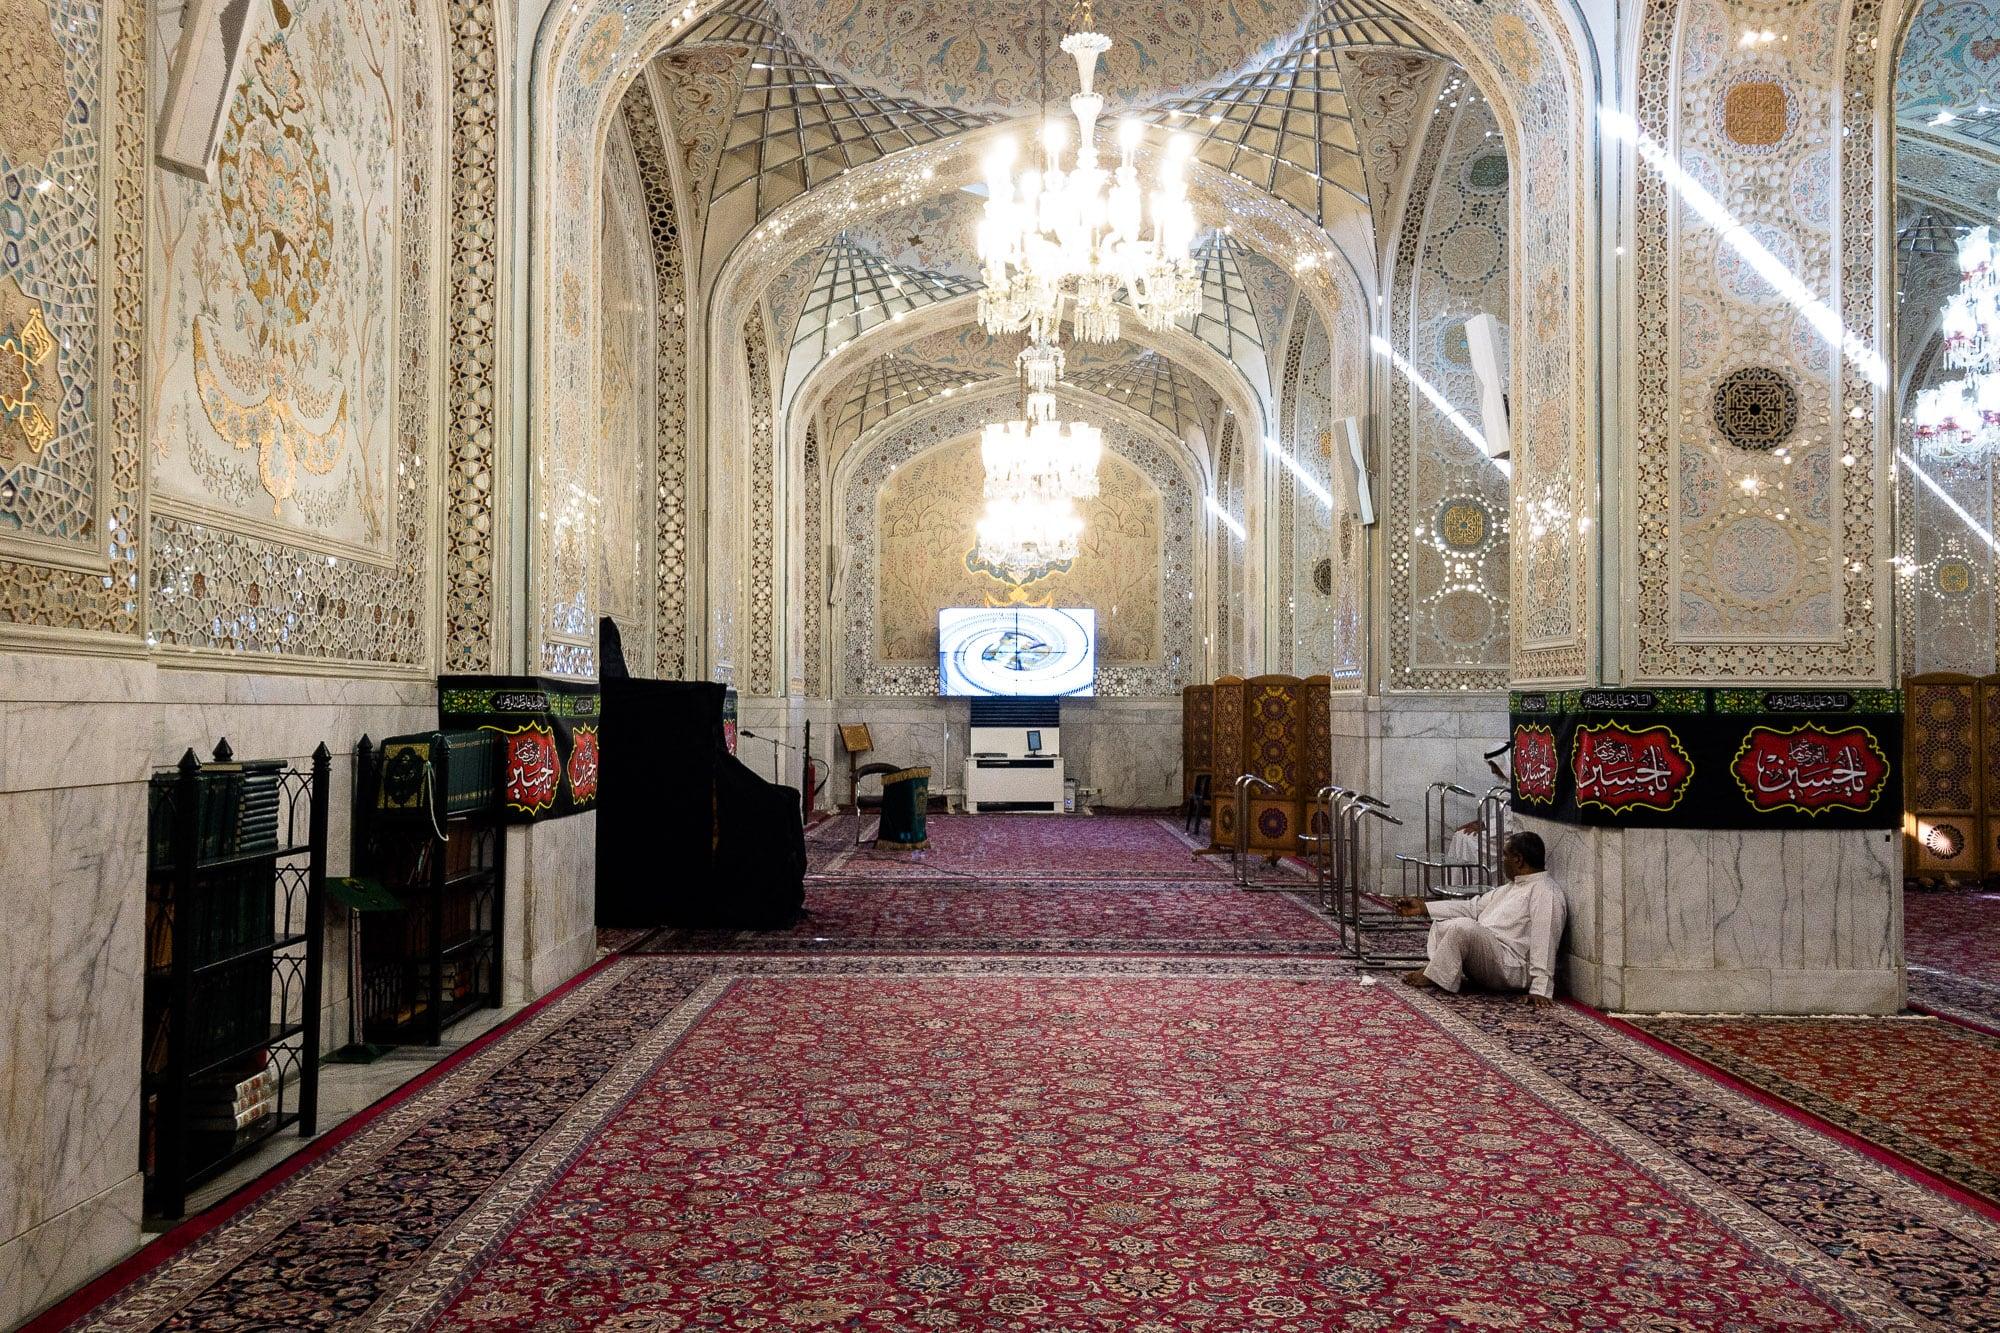 visitor center in the shrine of Imam Reza